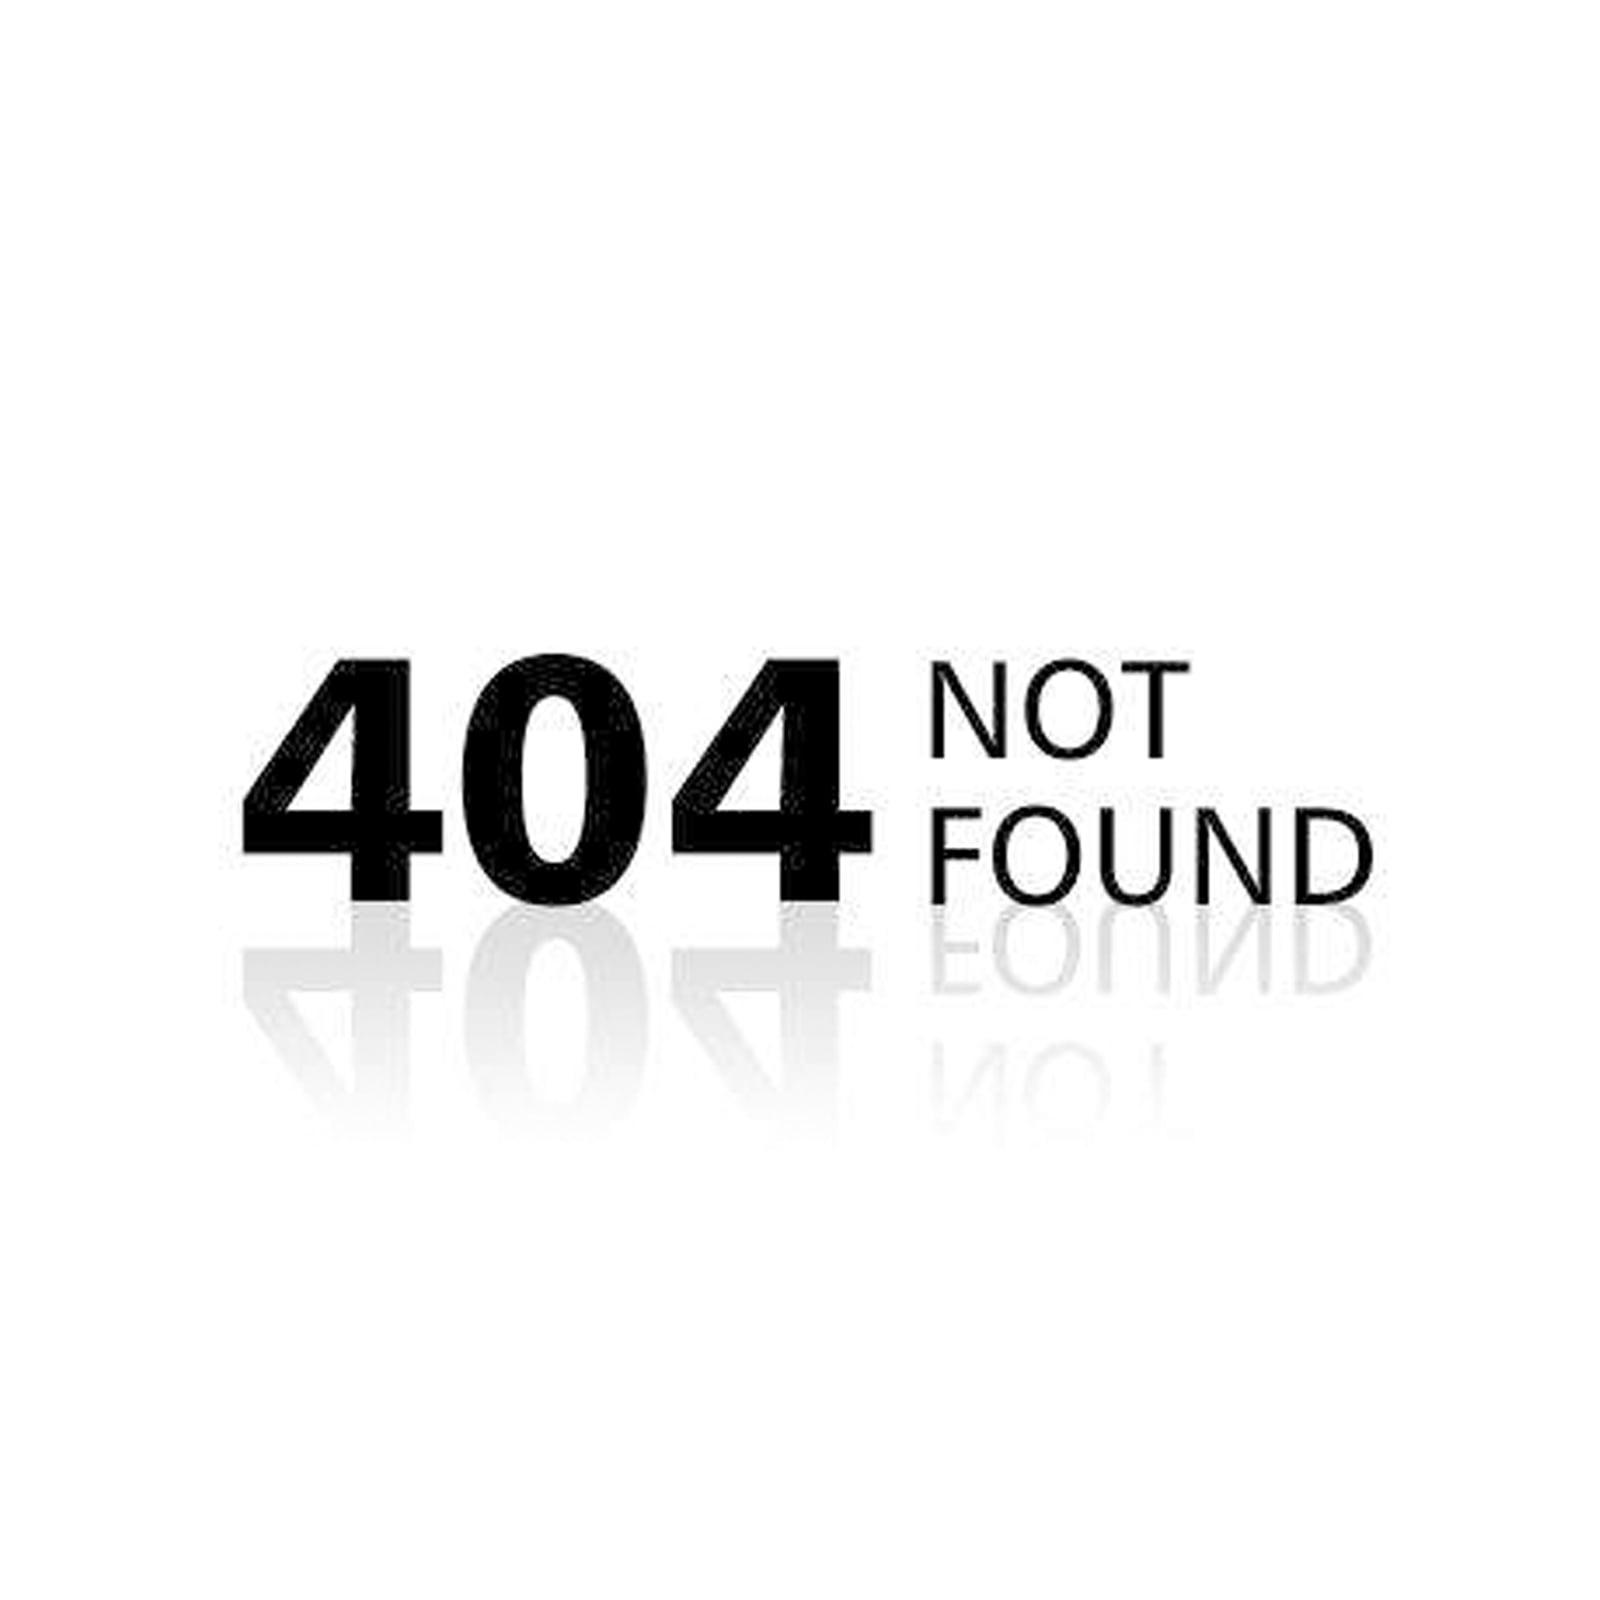 Dyson 404 not found стайлер от дайсон